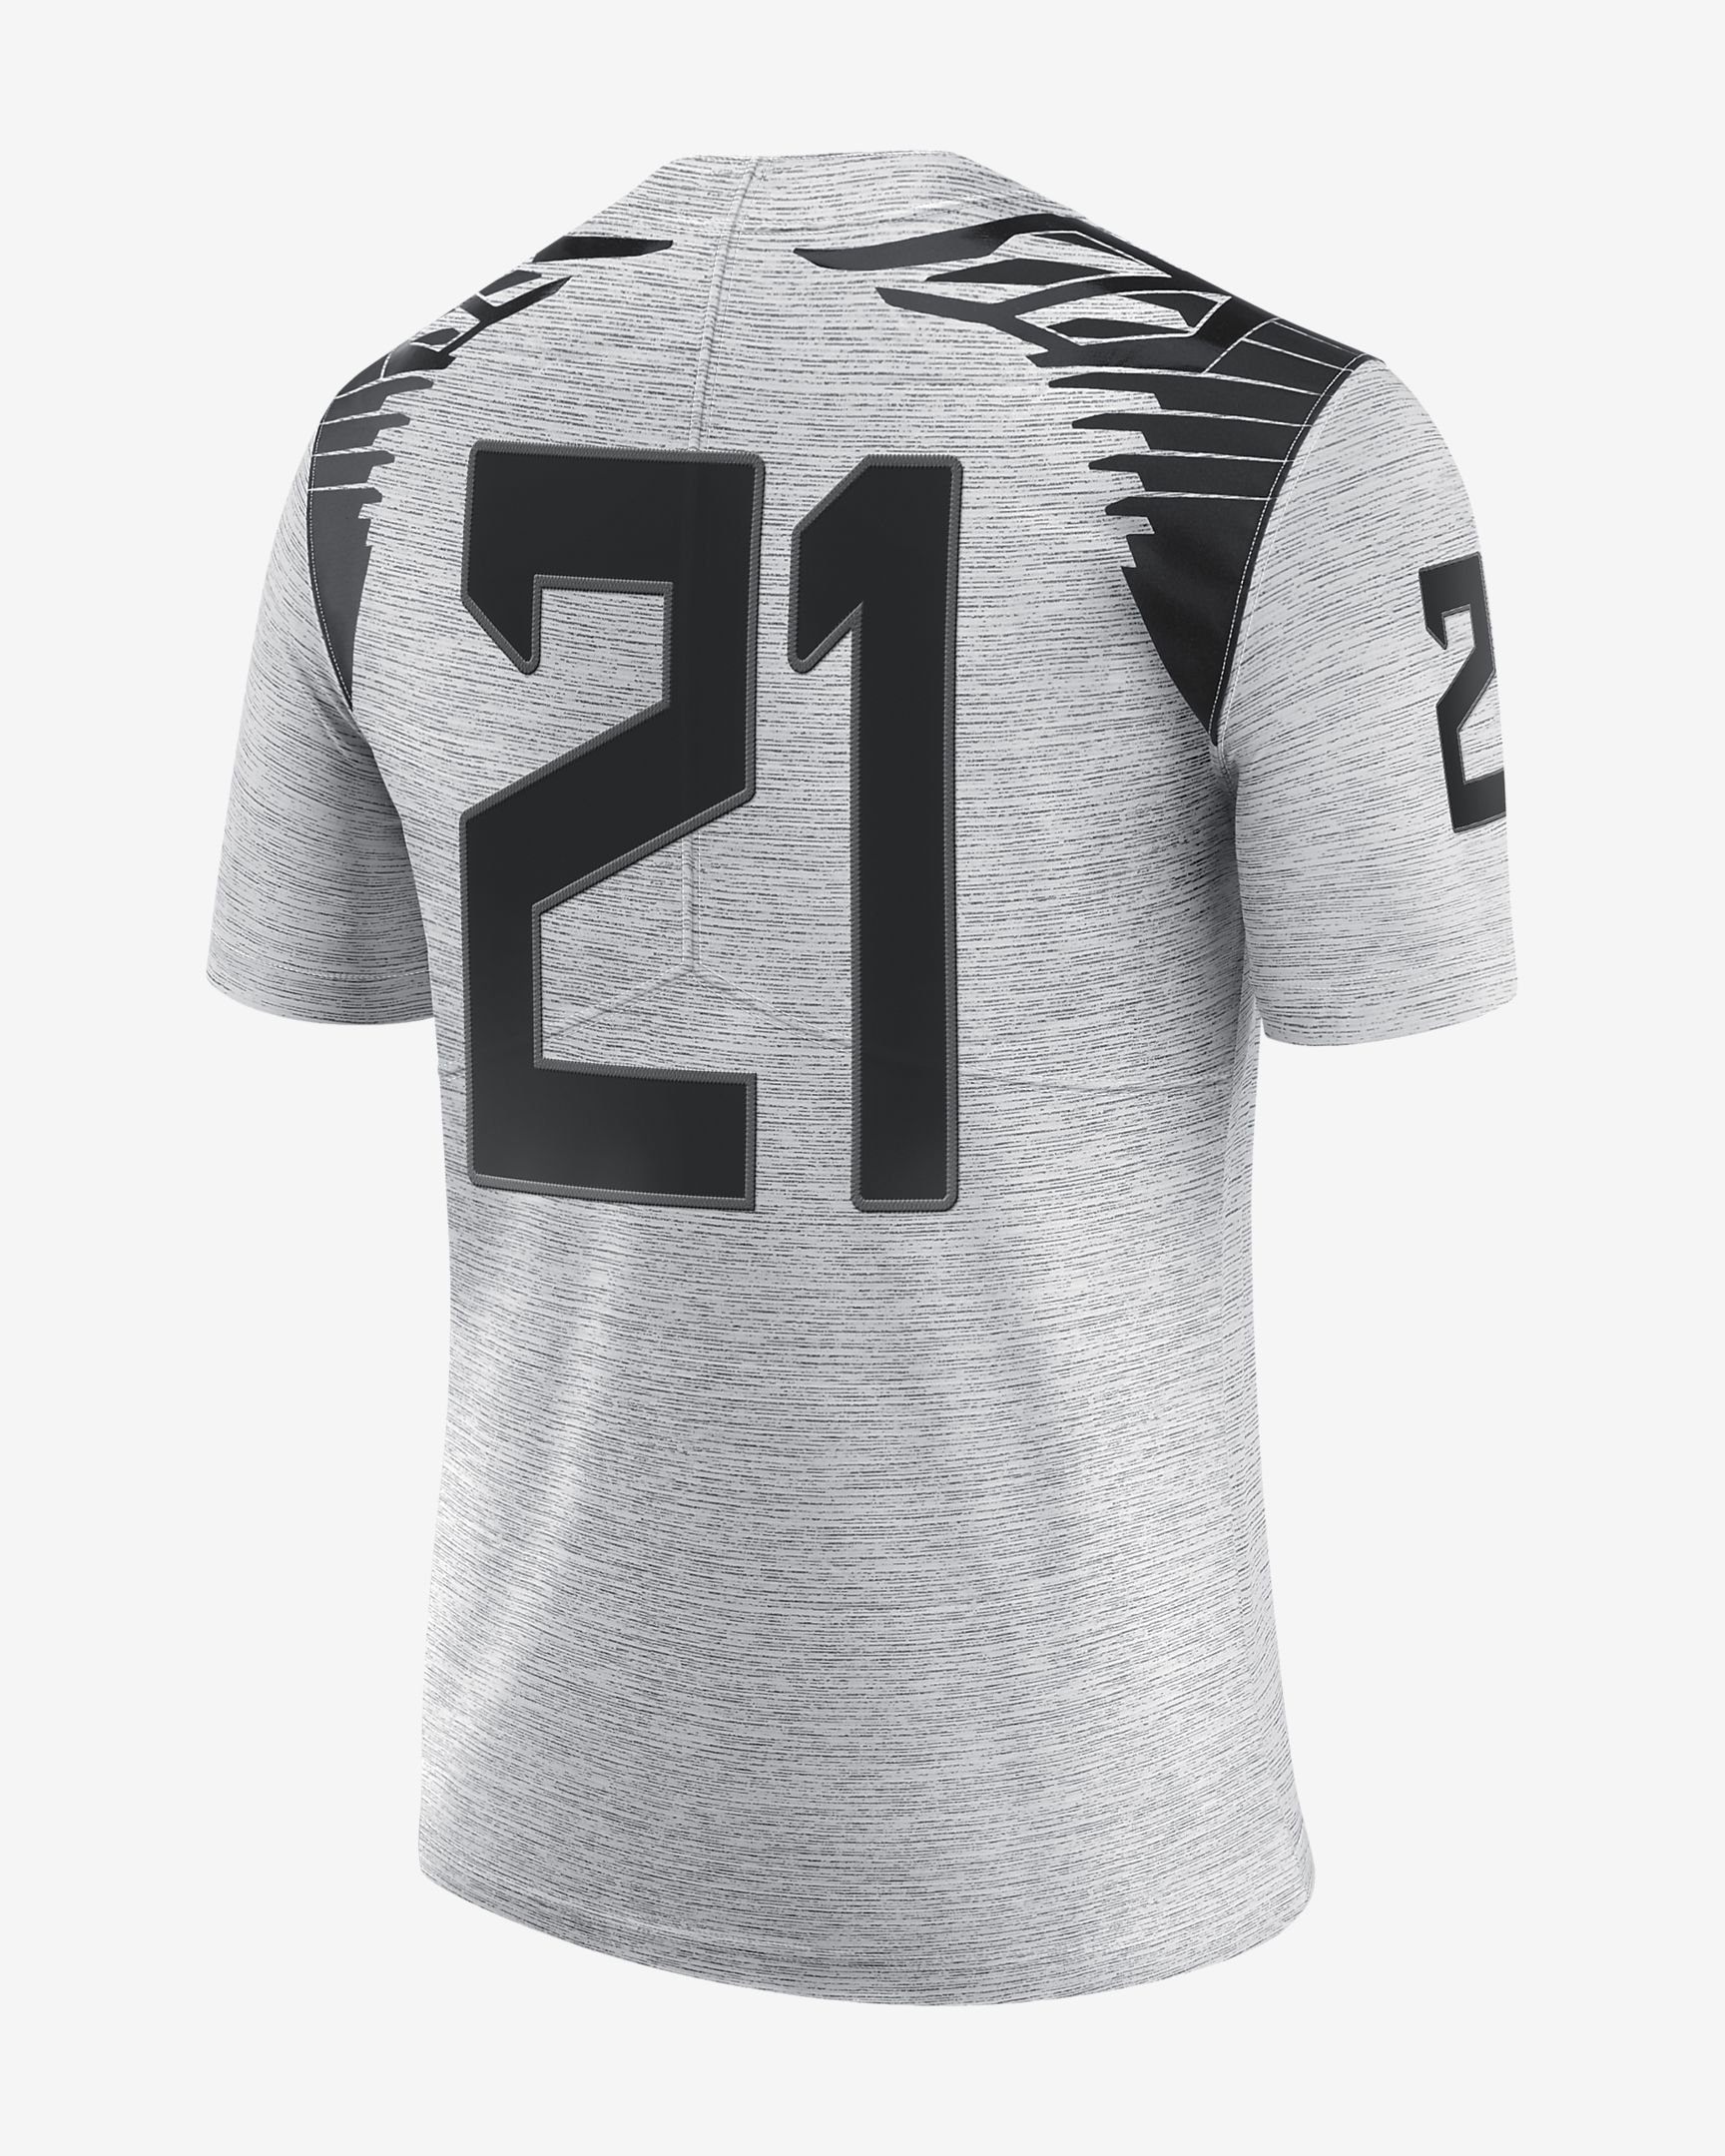 gridiron-grey-2-oregon-mens-football-jer